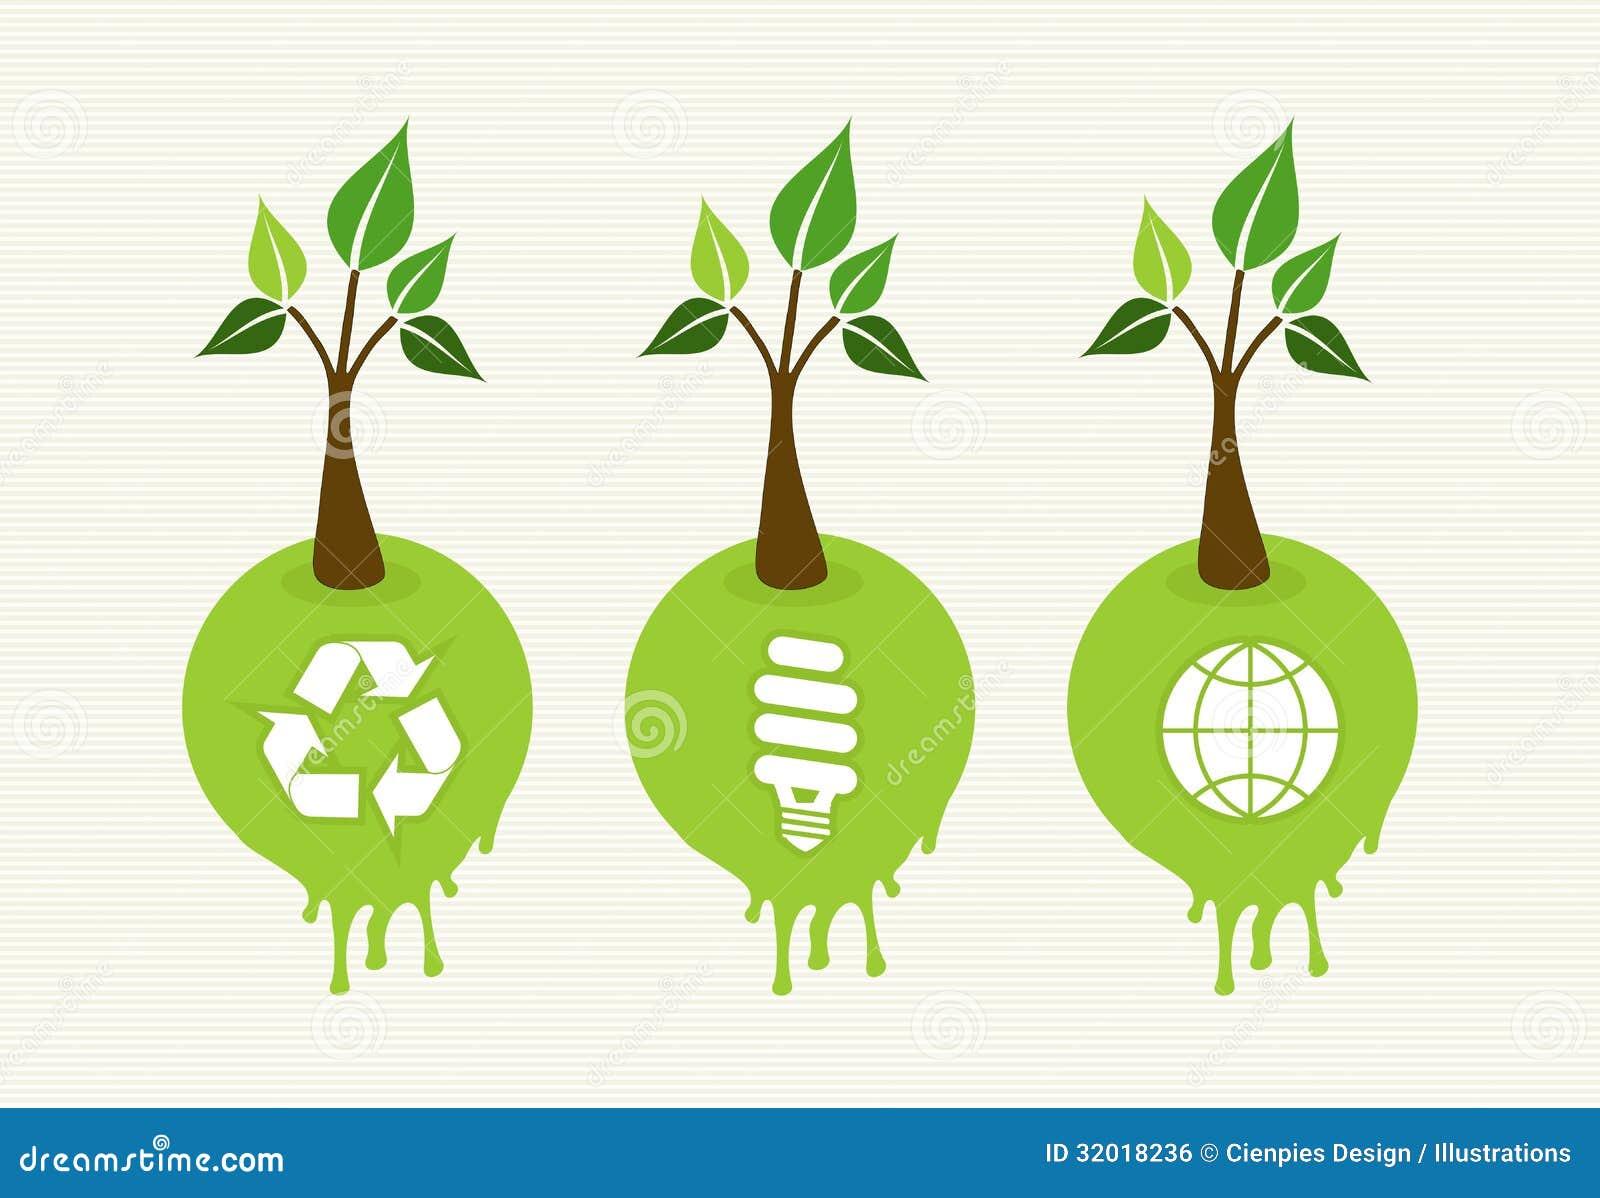 Скачать Eco Technology Flat Icons: Green Concept Tree Icon Set Royalty Free Stock Image